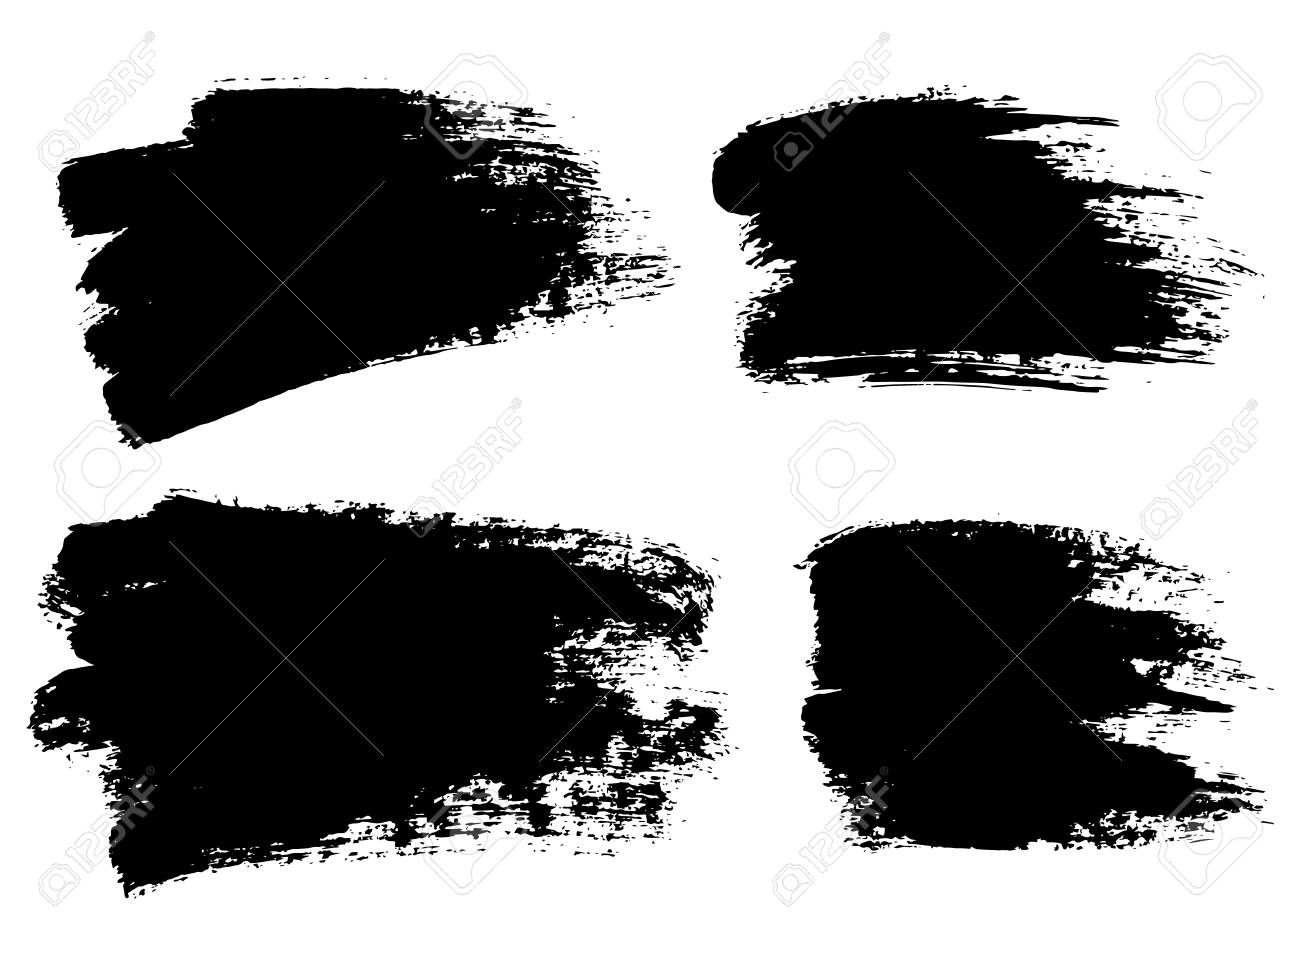 Painted Grunge Stripes Set Black Labels Background Paint Texture